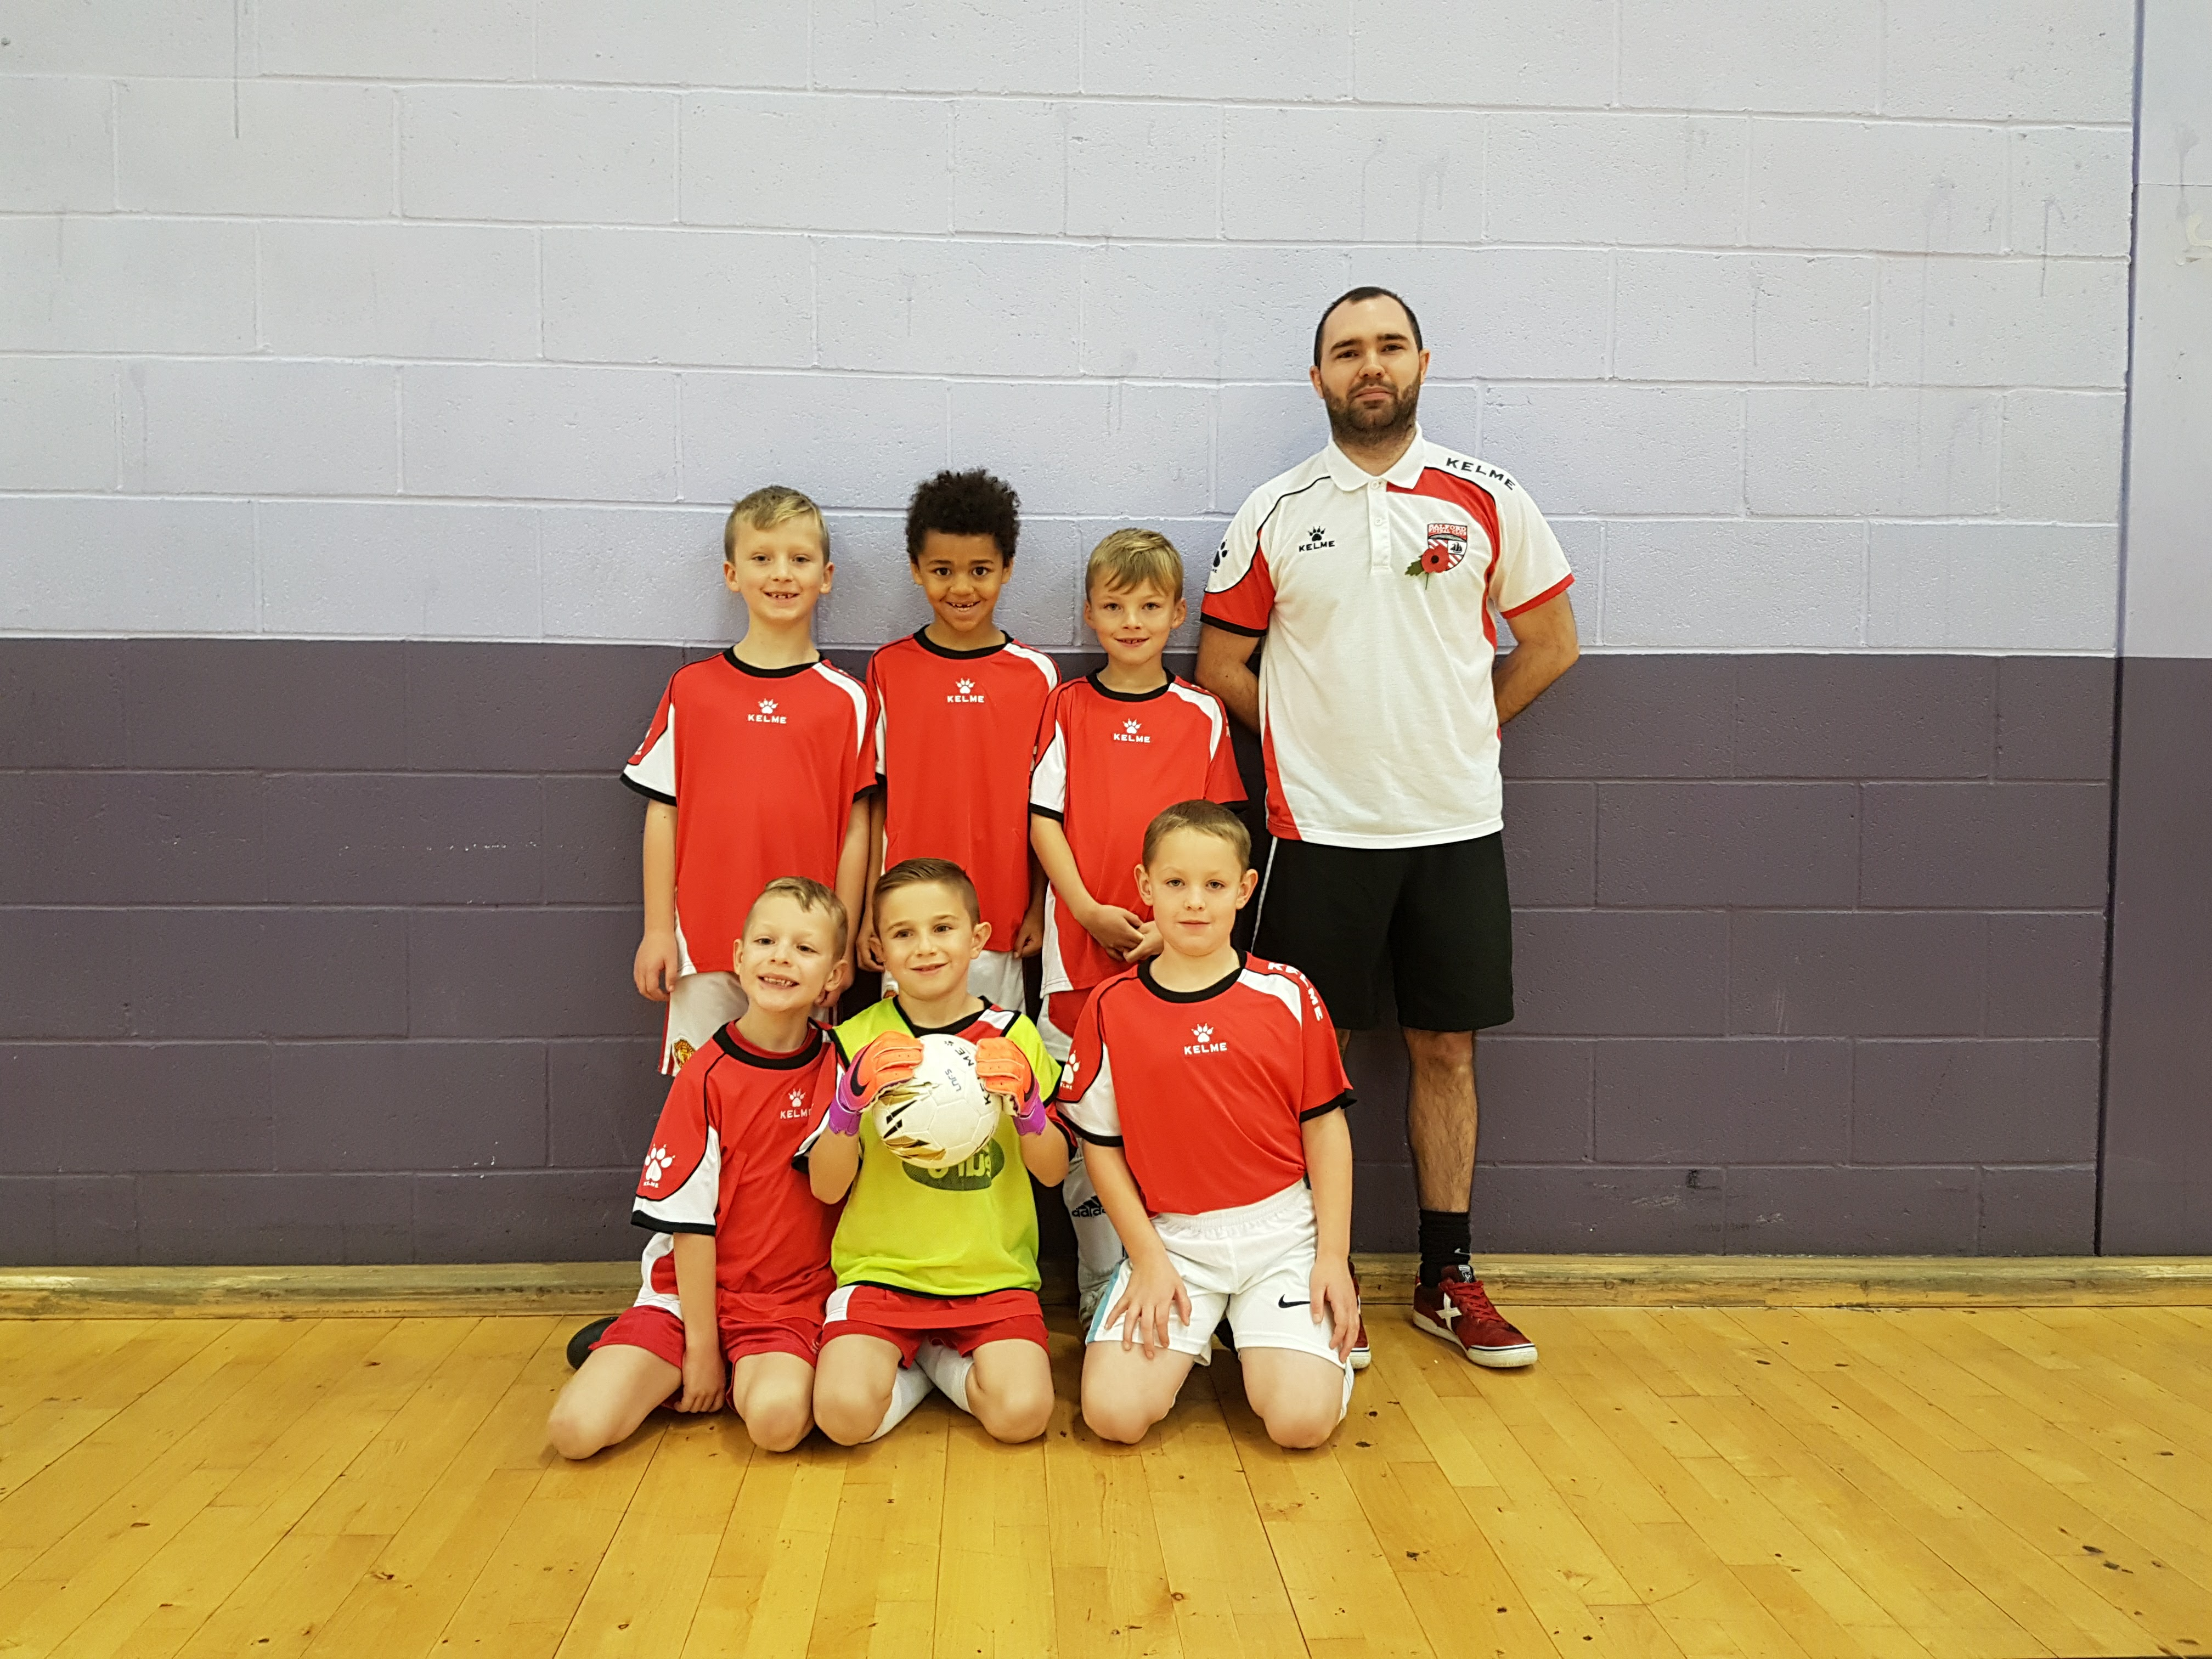 The Futsal Indy / Salford Futsal Club